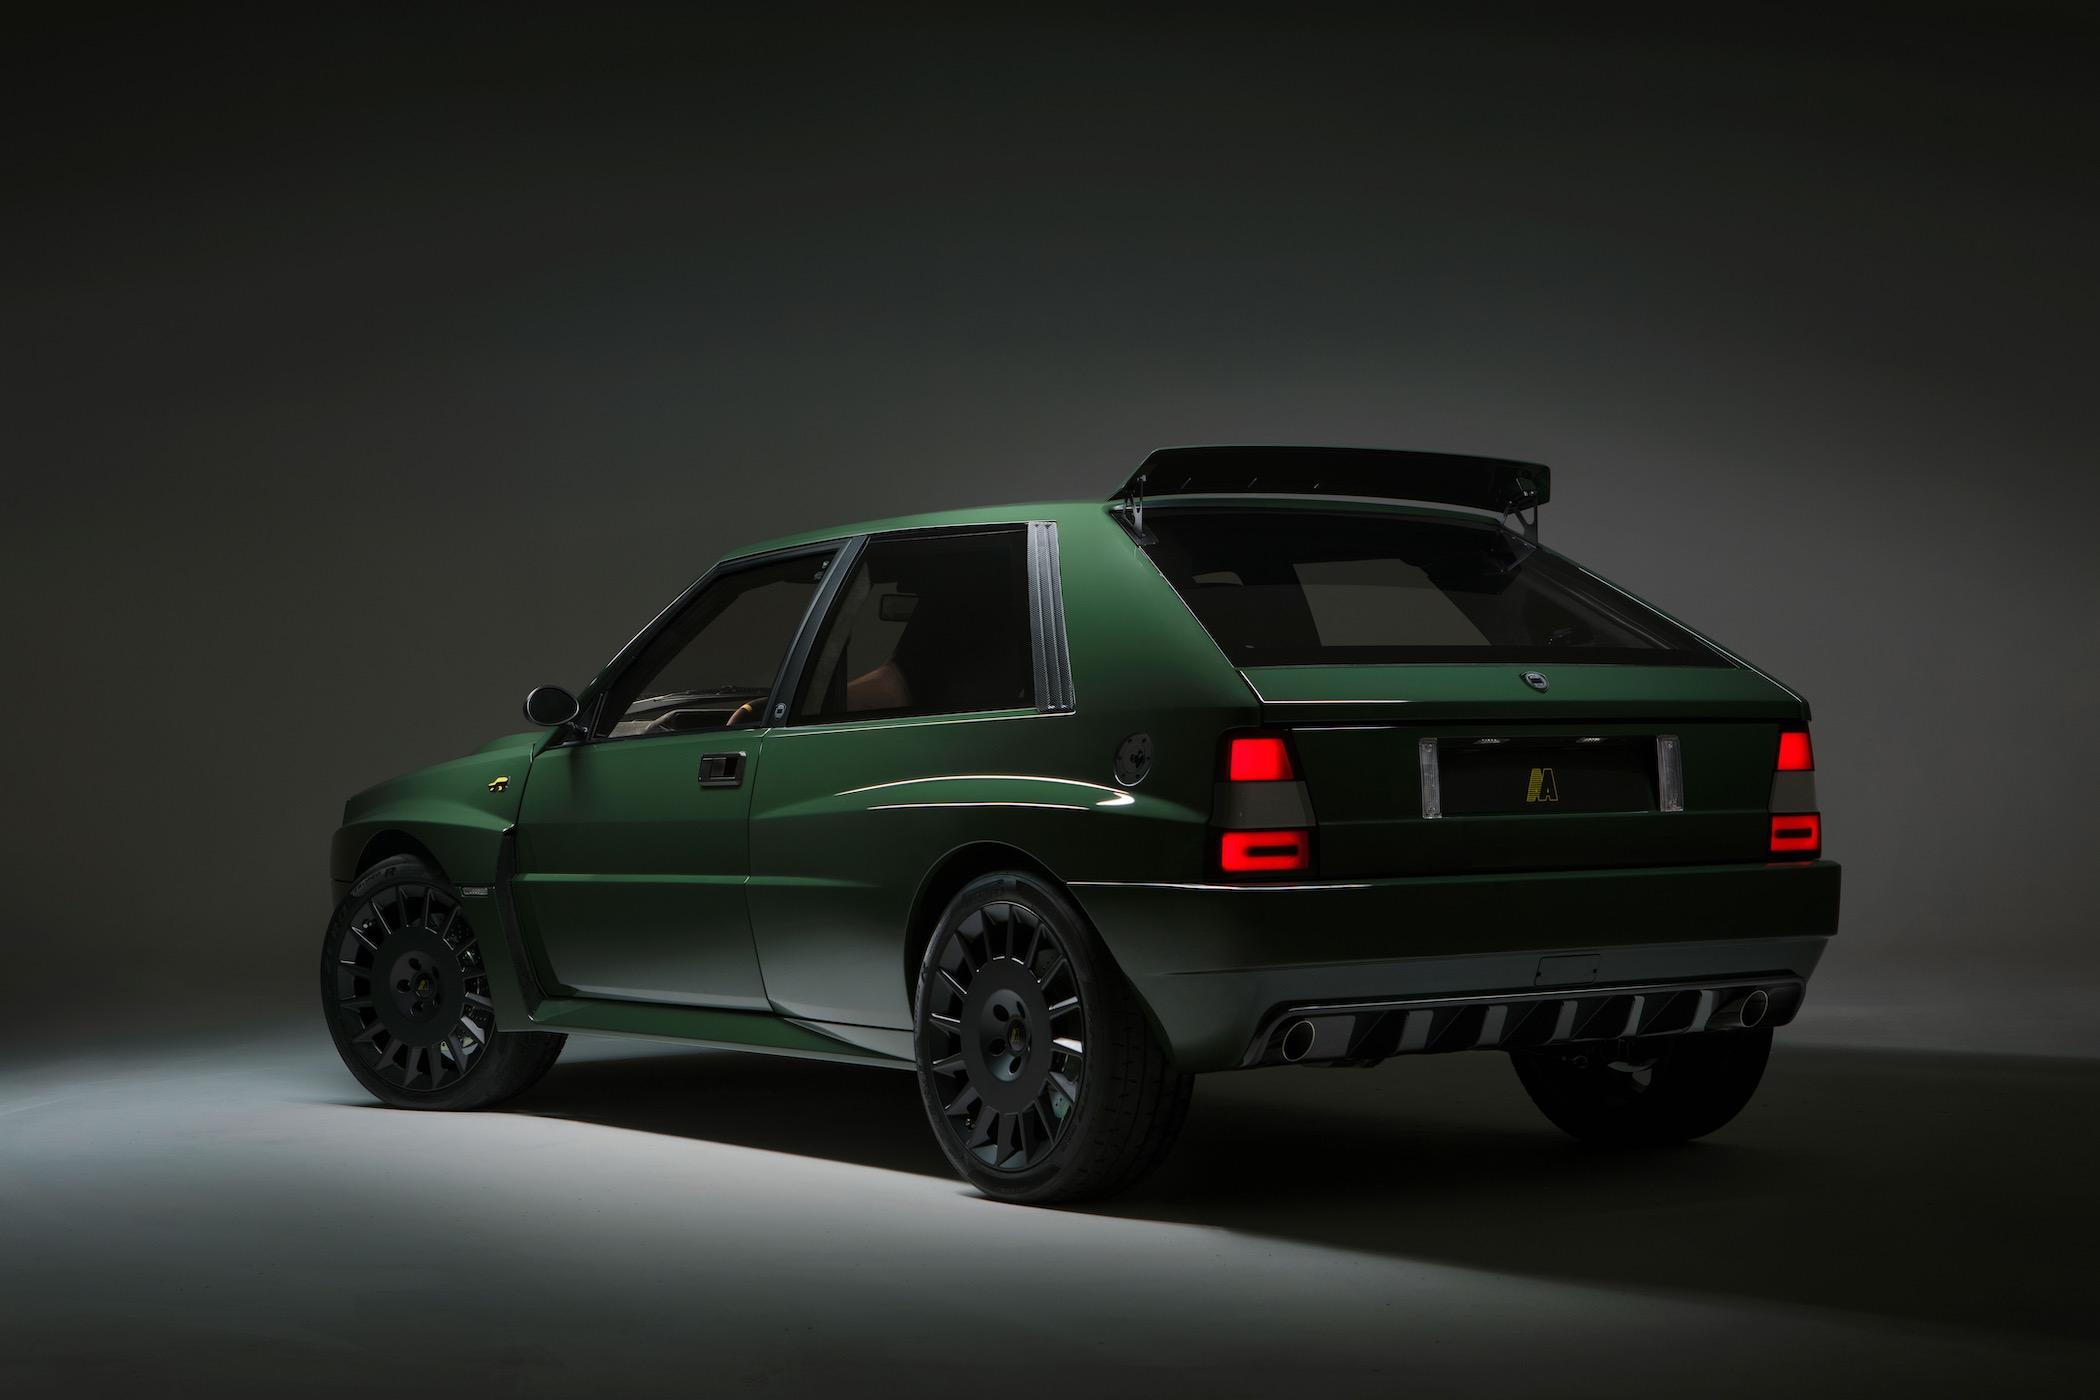 Automobili Amos Lancia Delta Futurista - Ressence - 1